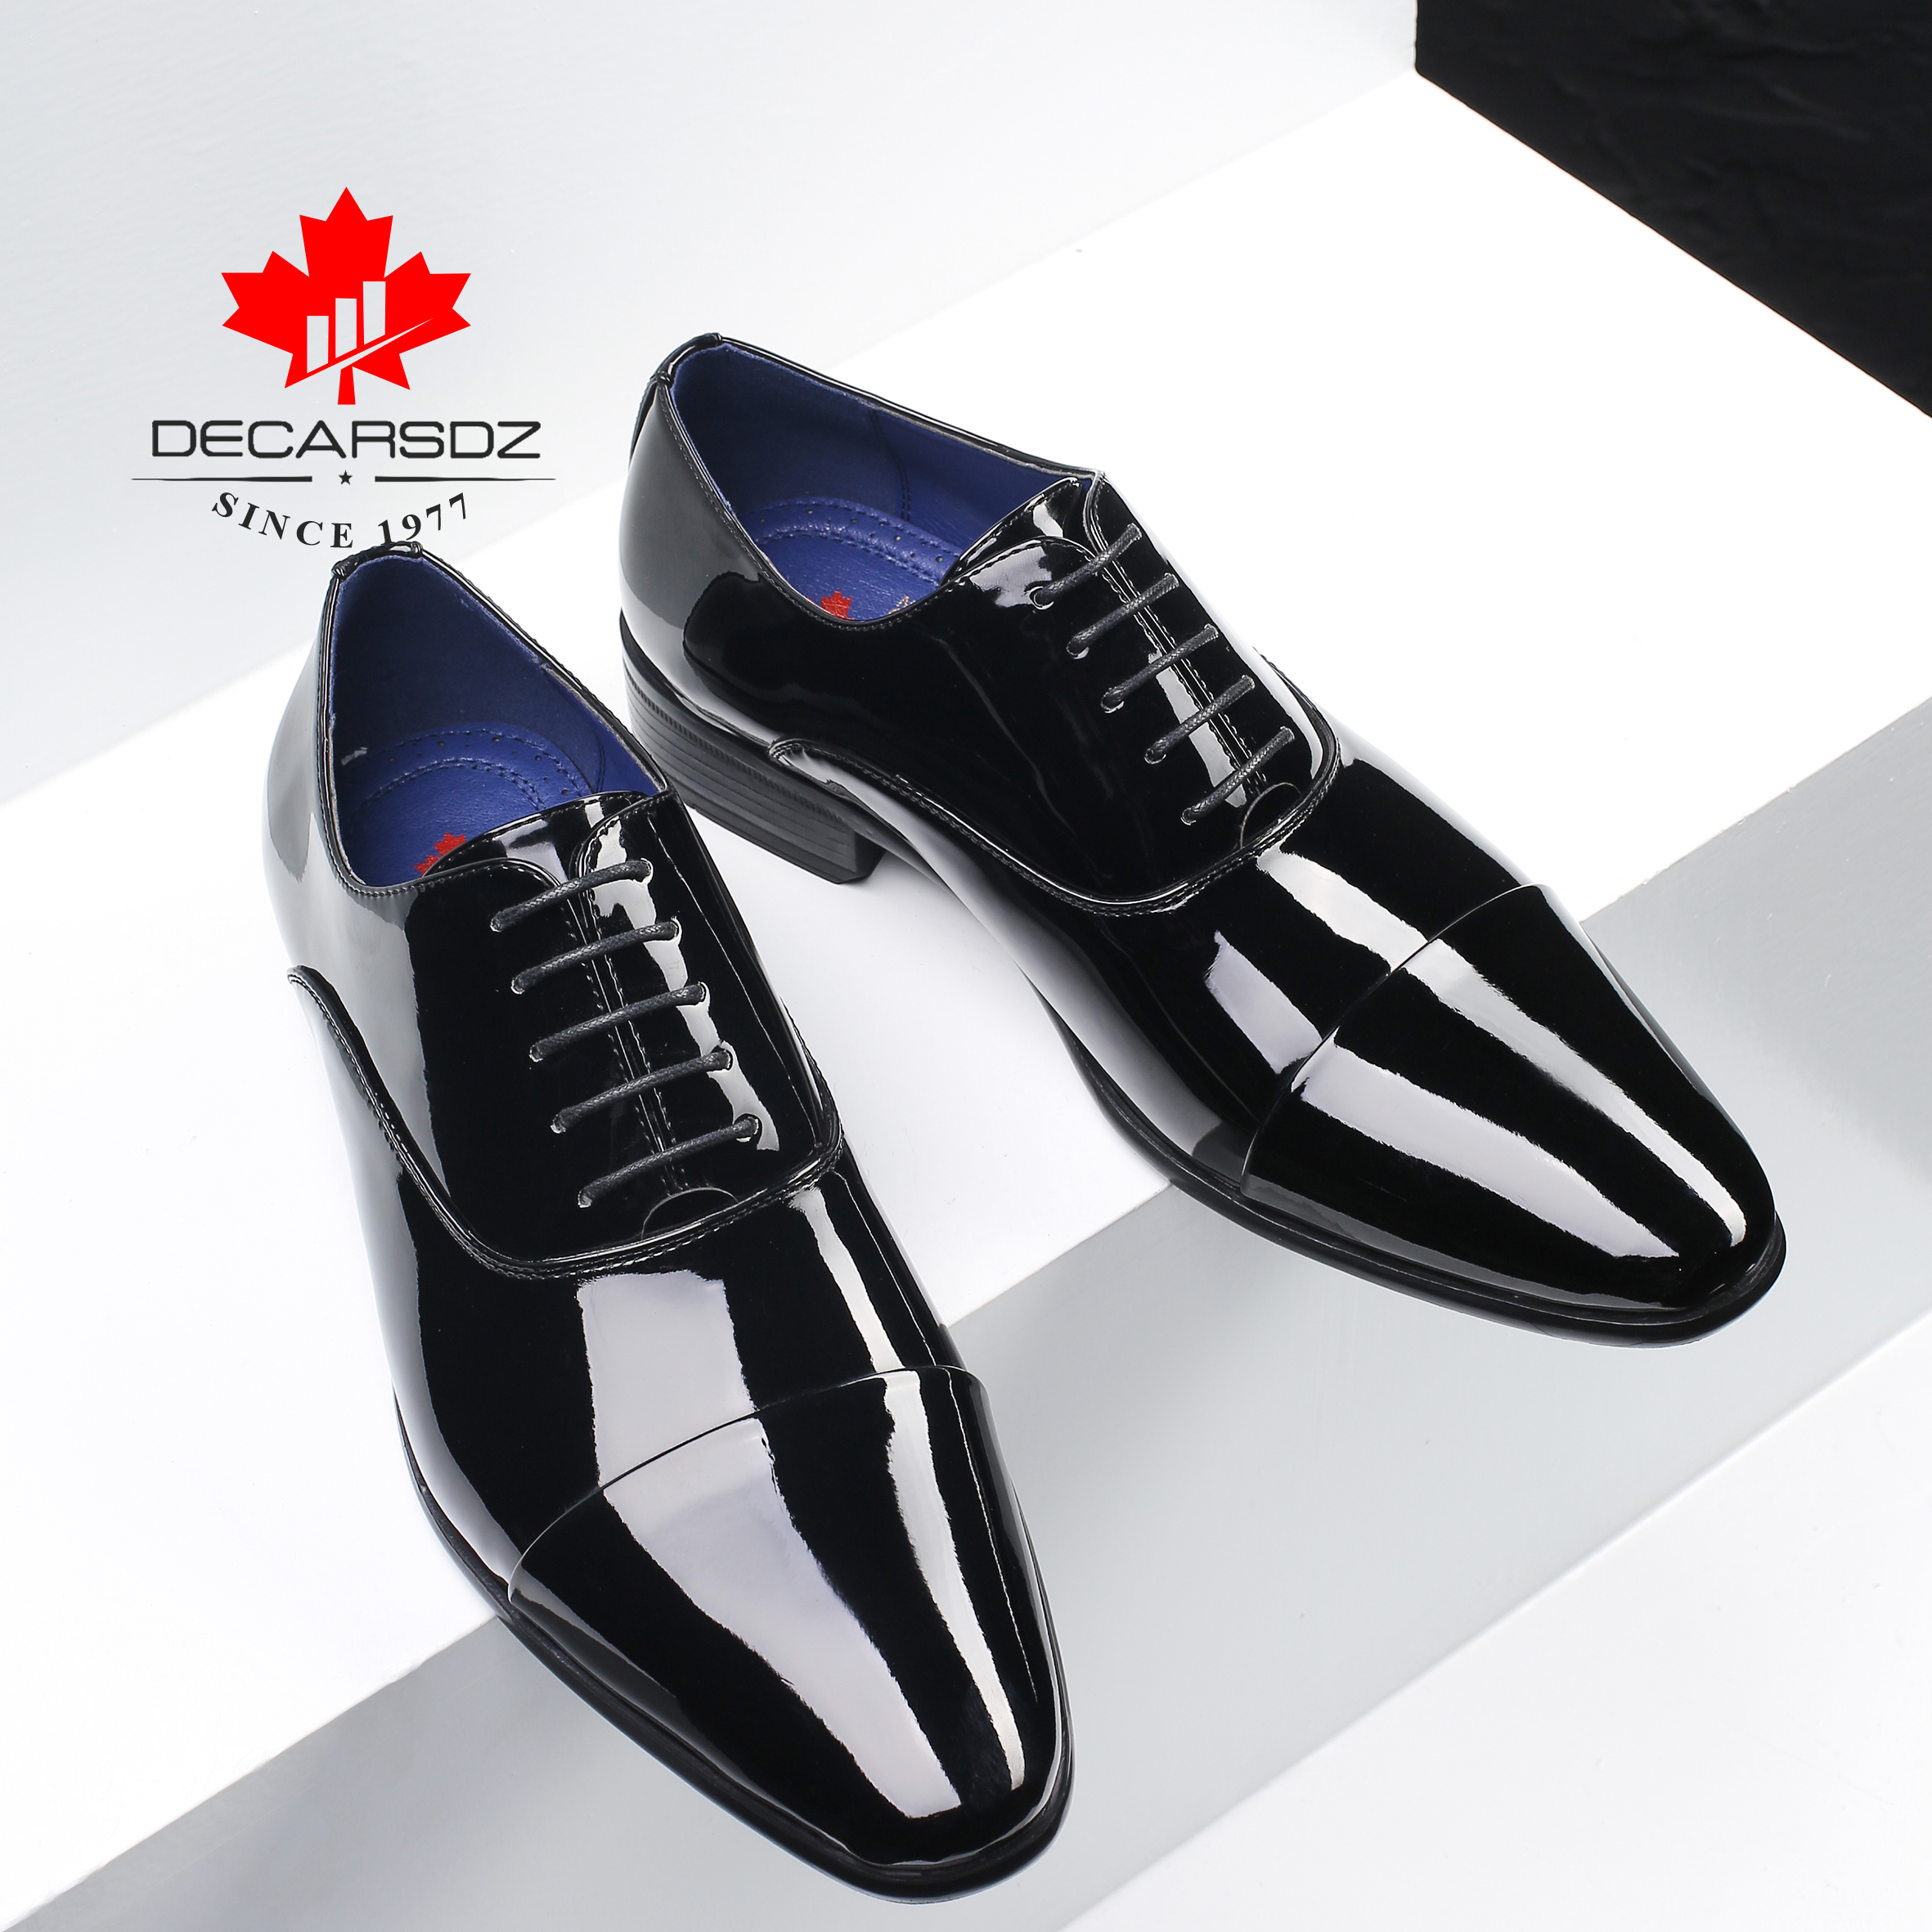 High quality shoes men, DECARSDZ dress shoes,Mirrored fashion mens shoes designed in Paris,business shoes men oxford leatherHigh quality shoes men, DECARSDZ dress shoes,Mirrored fashion mens shoes designed in Paris,business shoes men oxford leather